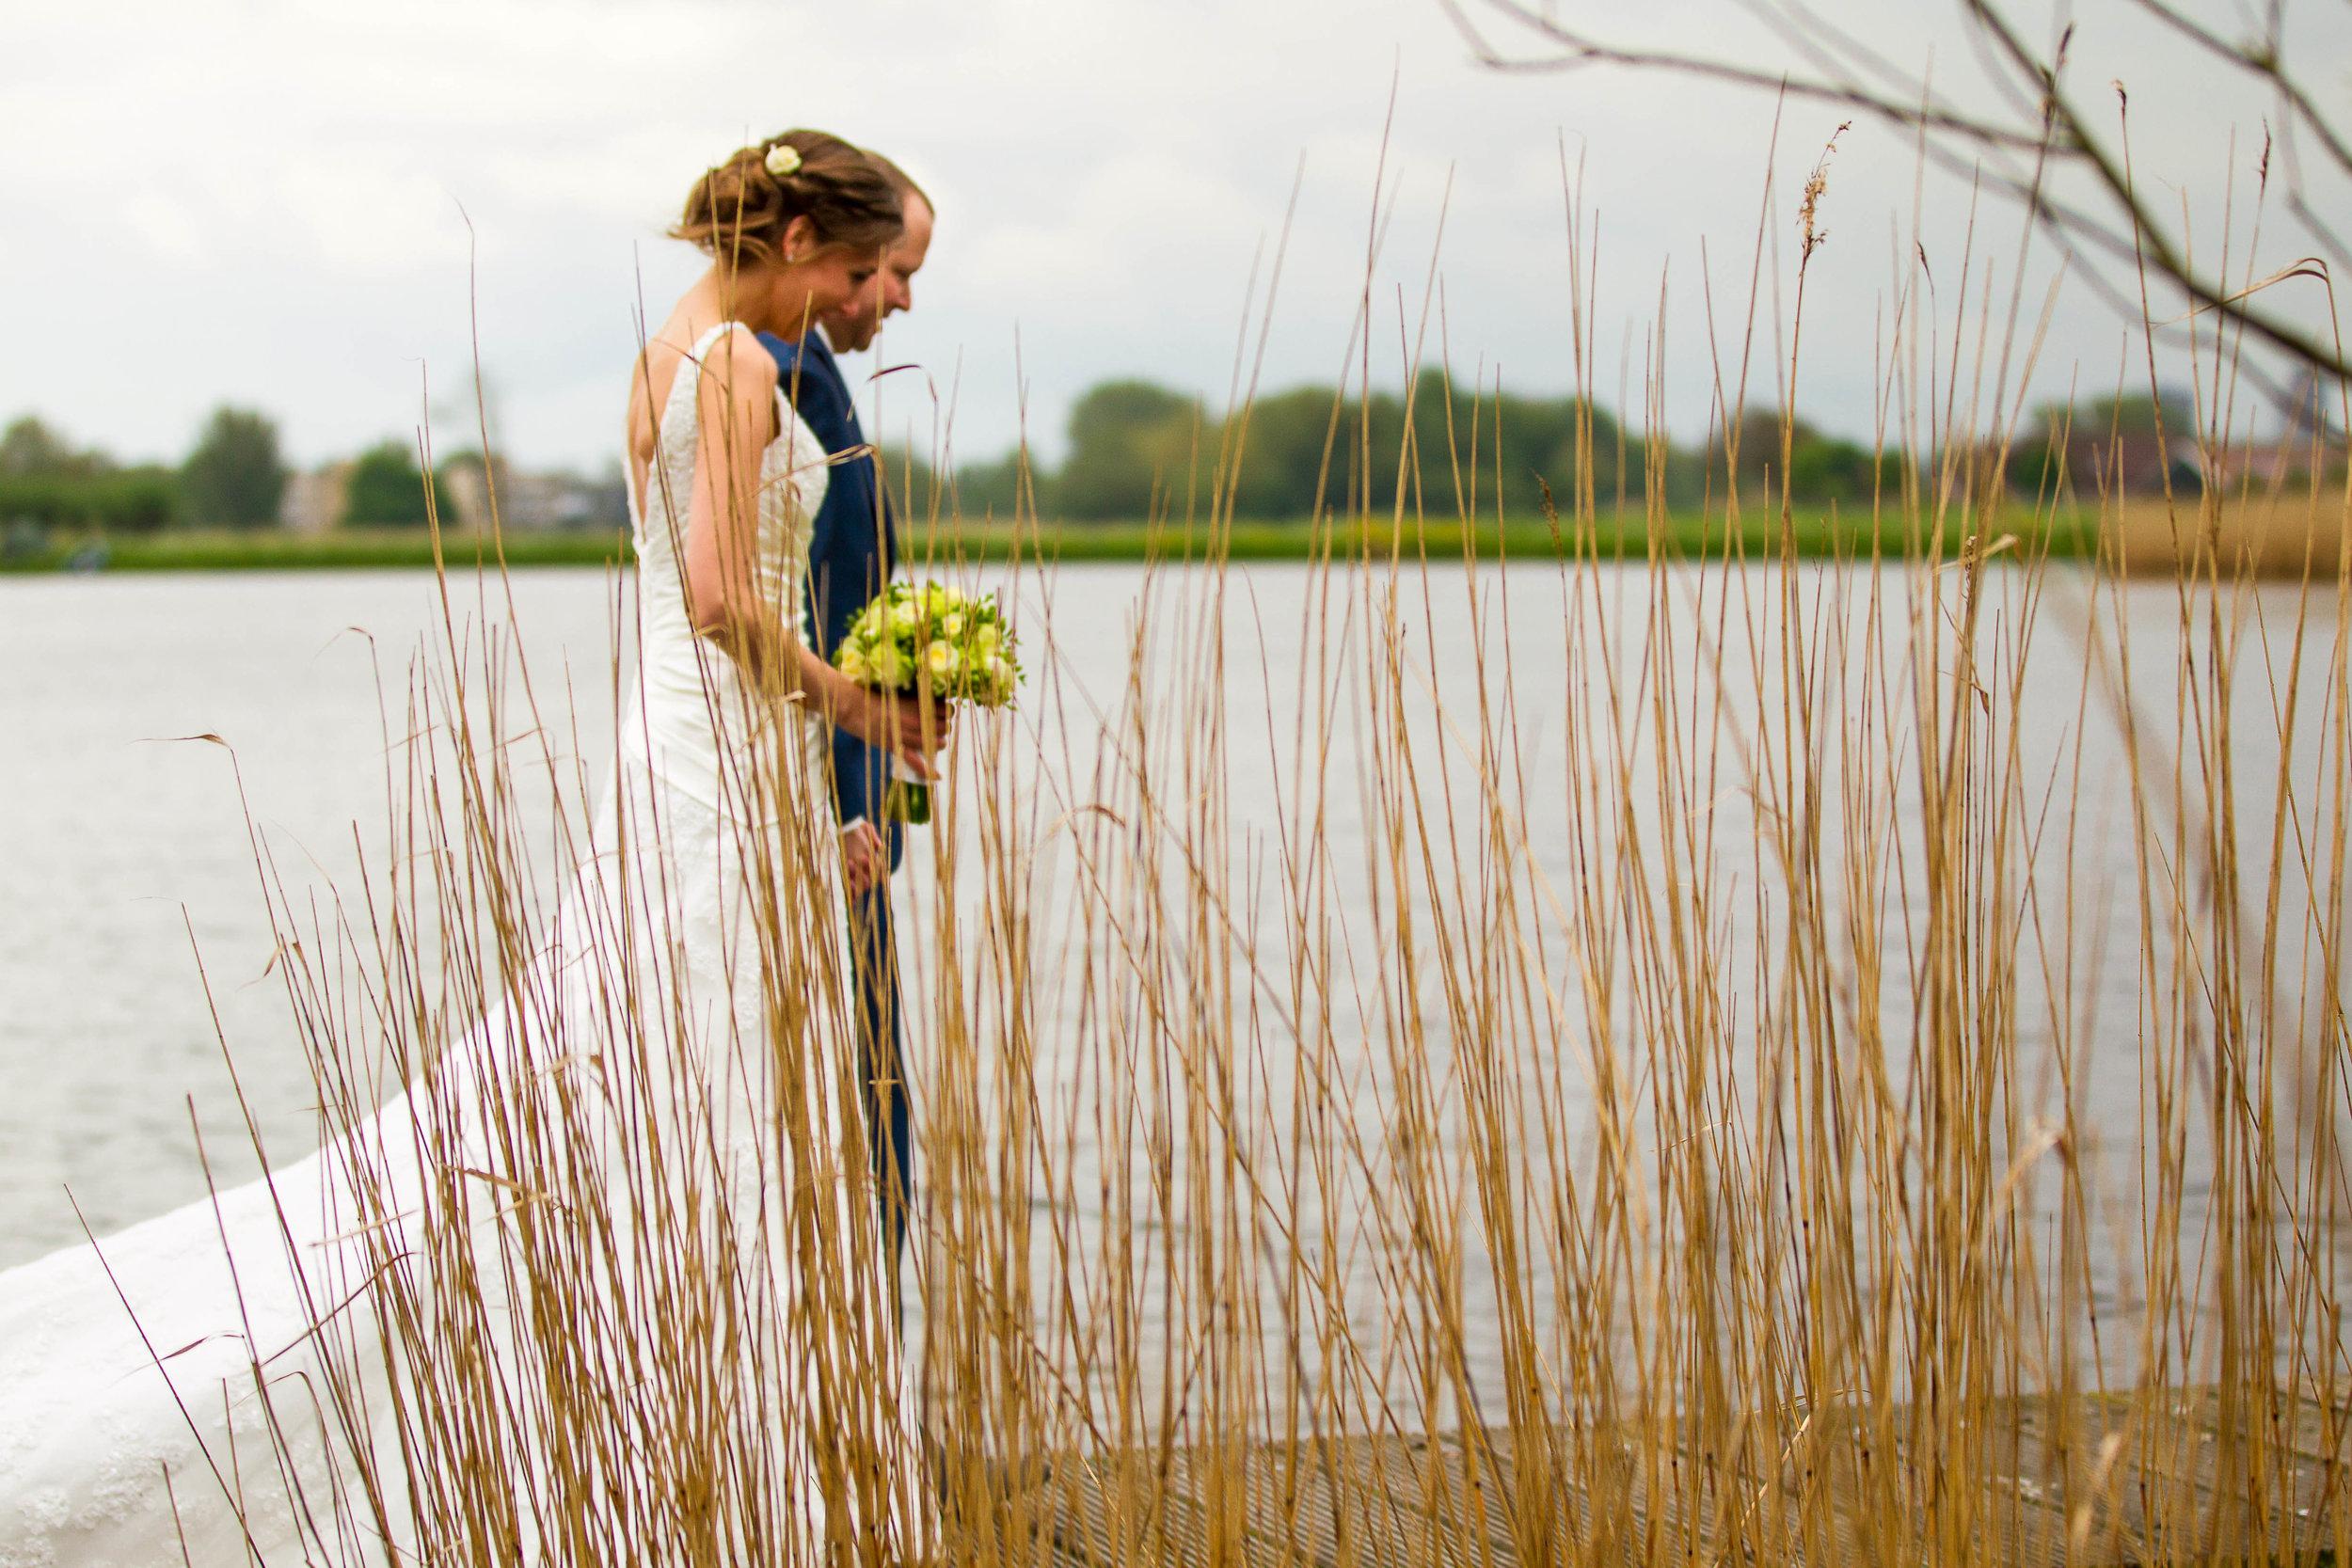 bruidsfotografie-trouwreportage-huwelijksfotografie-bruidsfotograaf-feestfotografie-Elise en Maarten-128.jpg